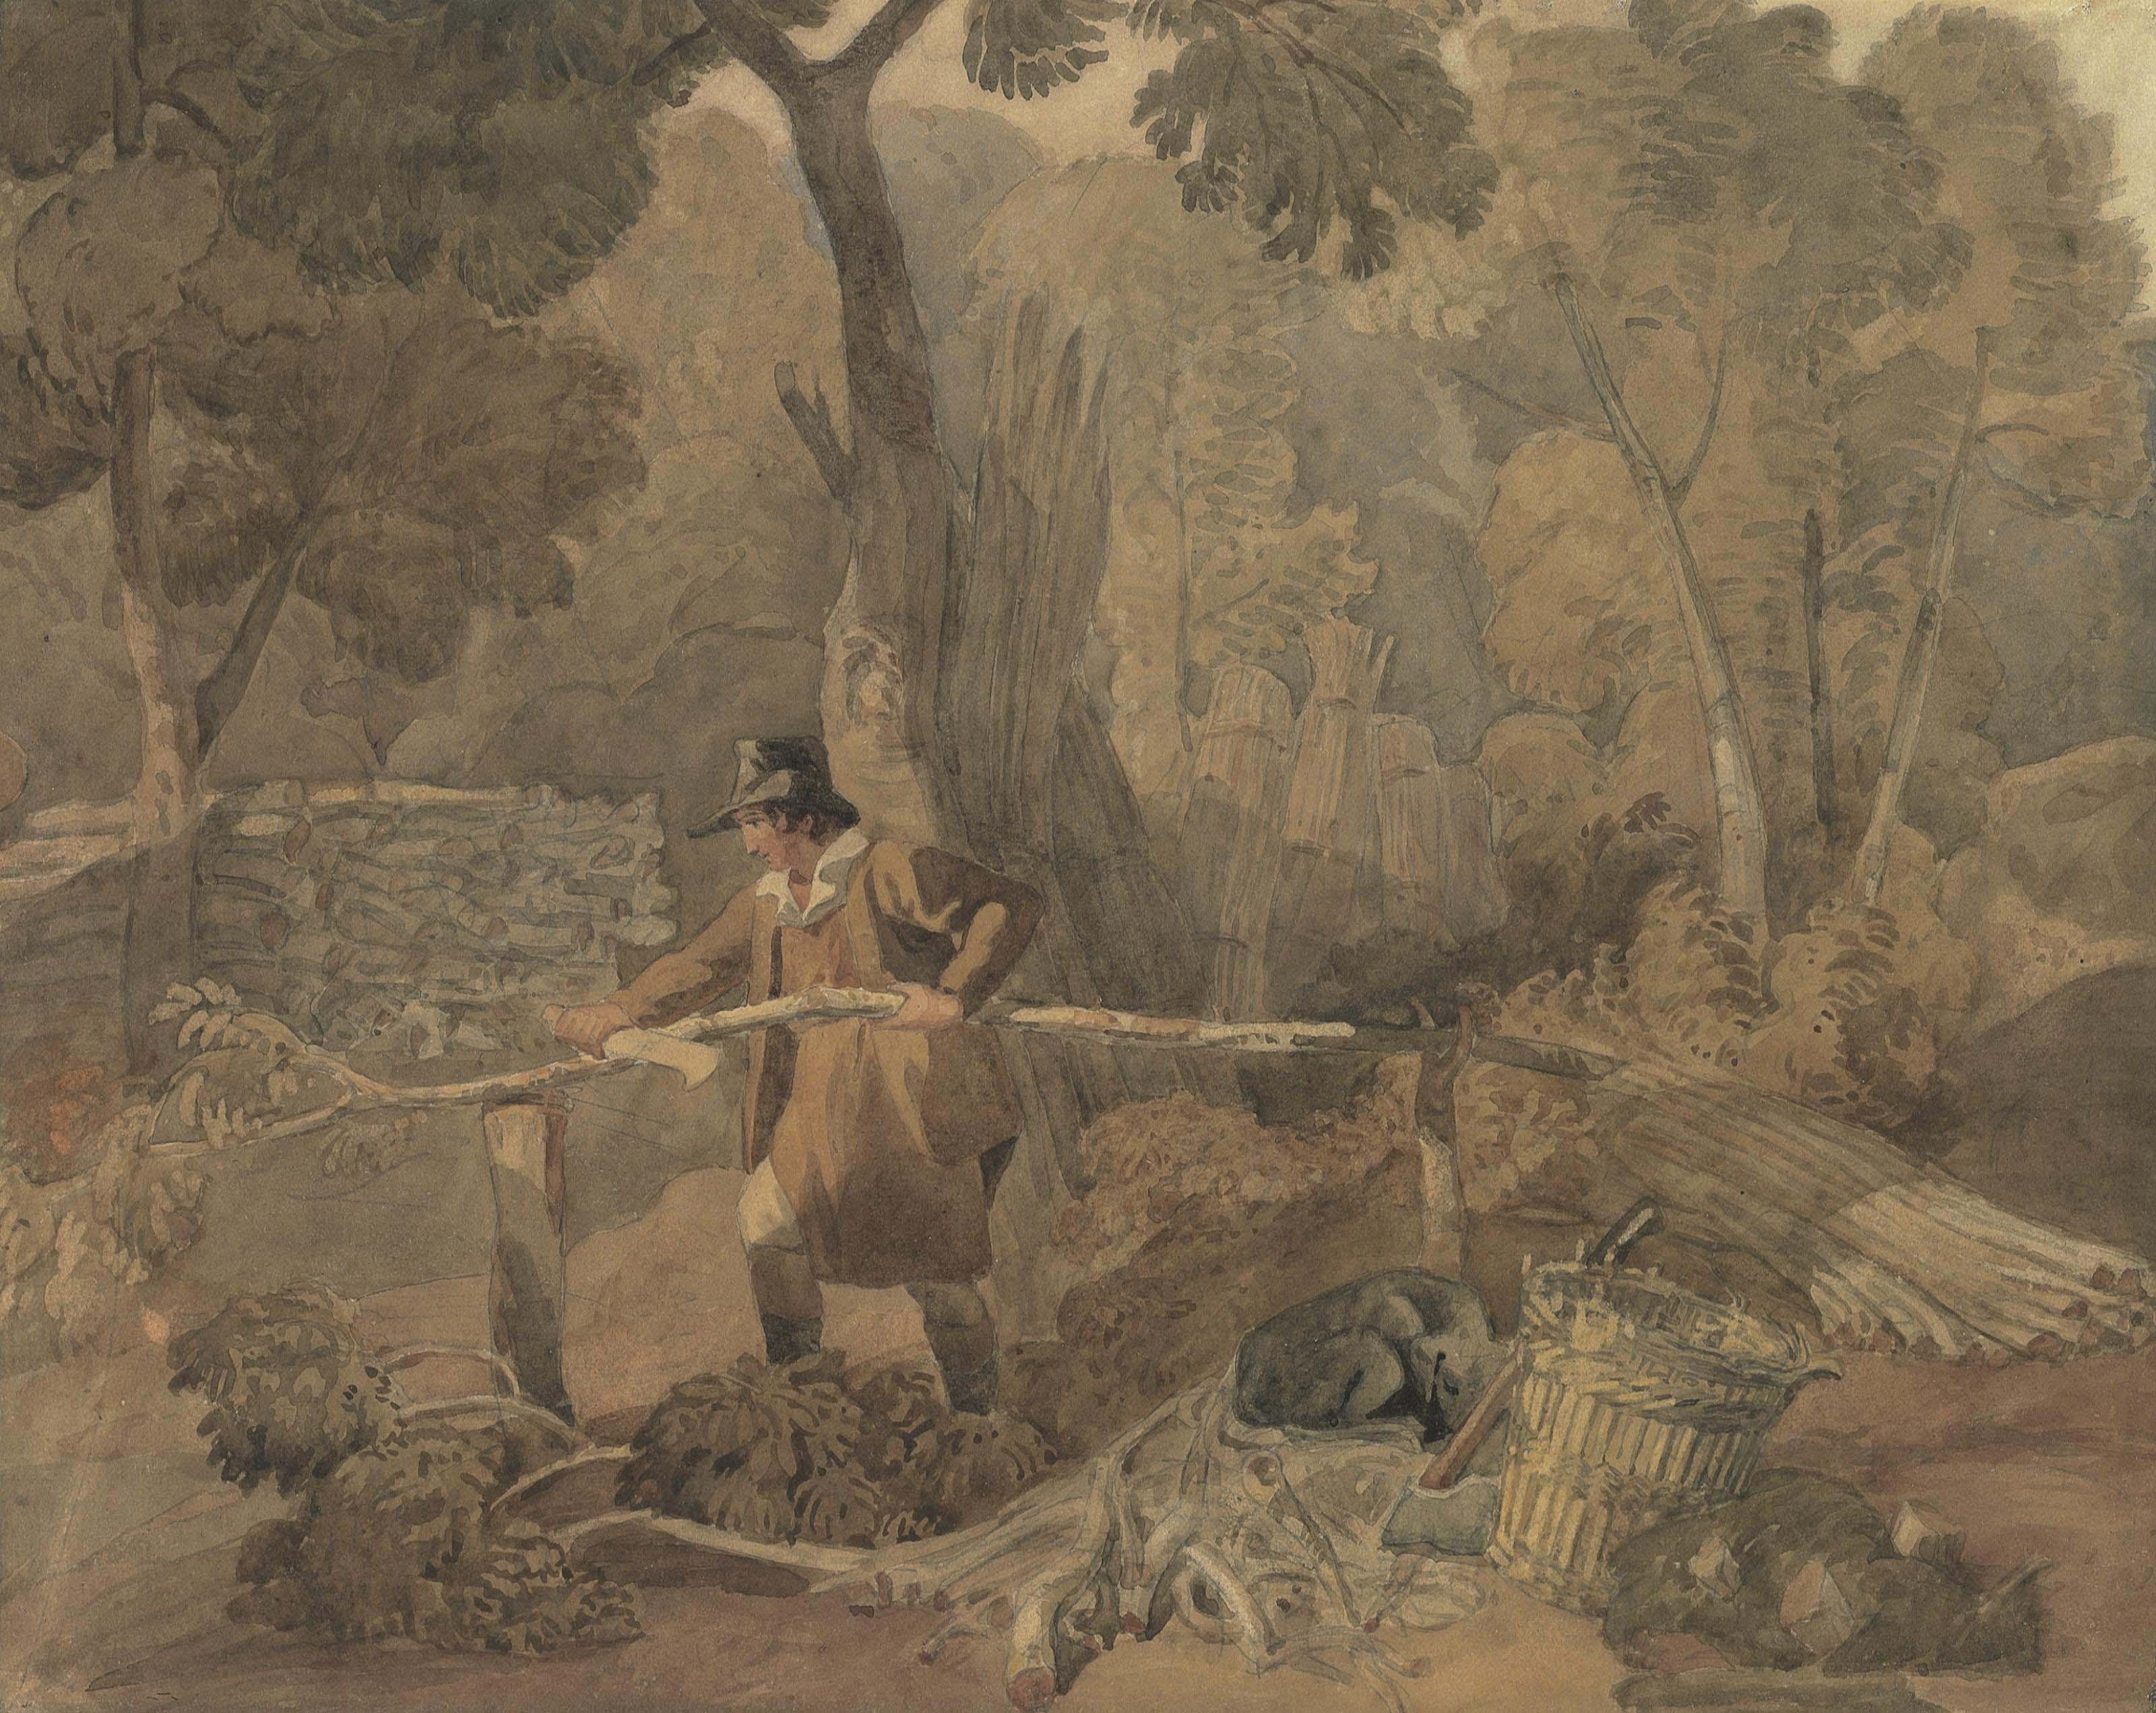 Joshua Cristall, P.O.W.S. (Cambourne 1763-1847 London)